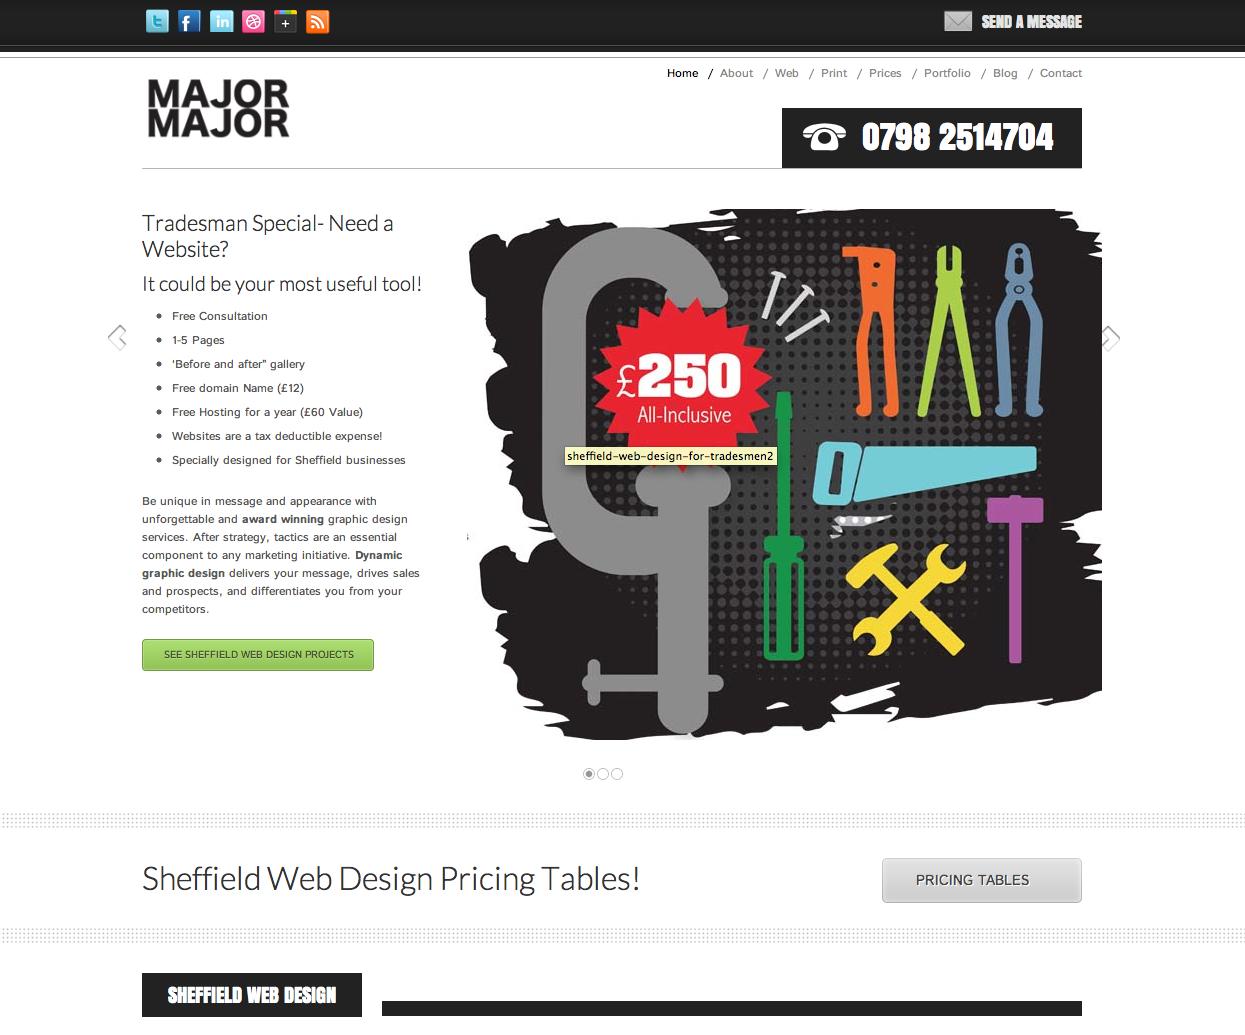 Major Major Design